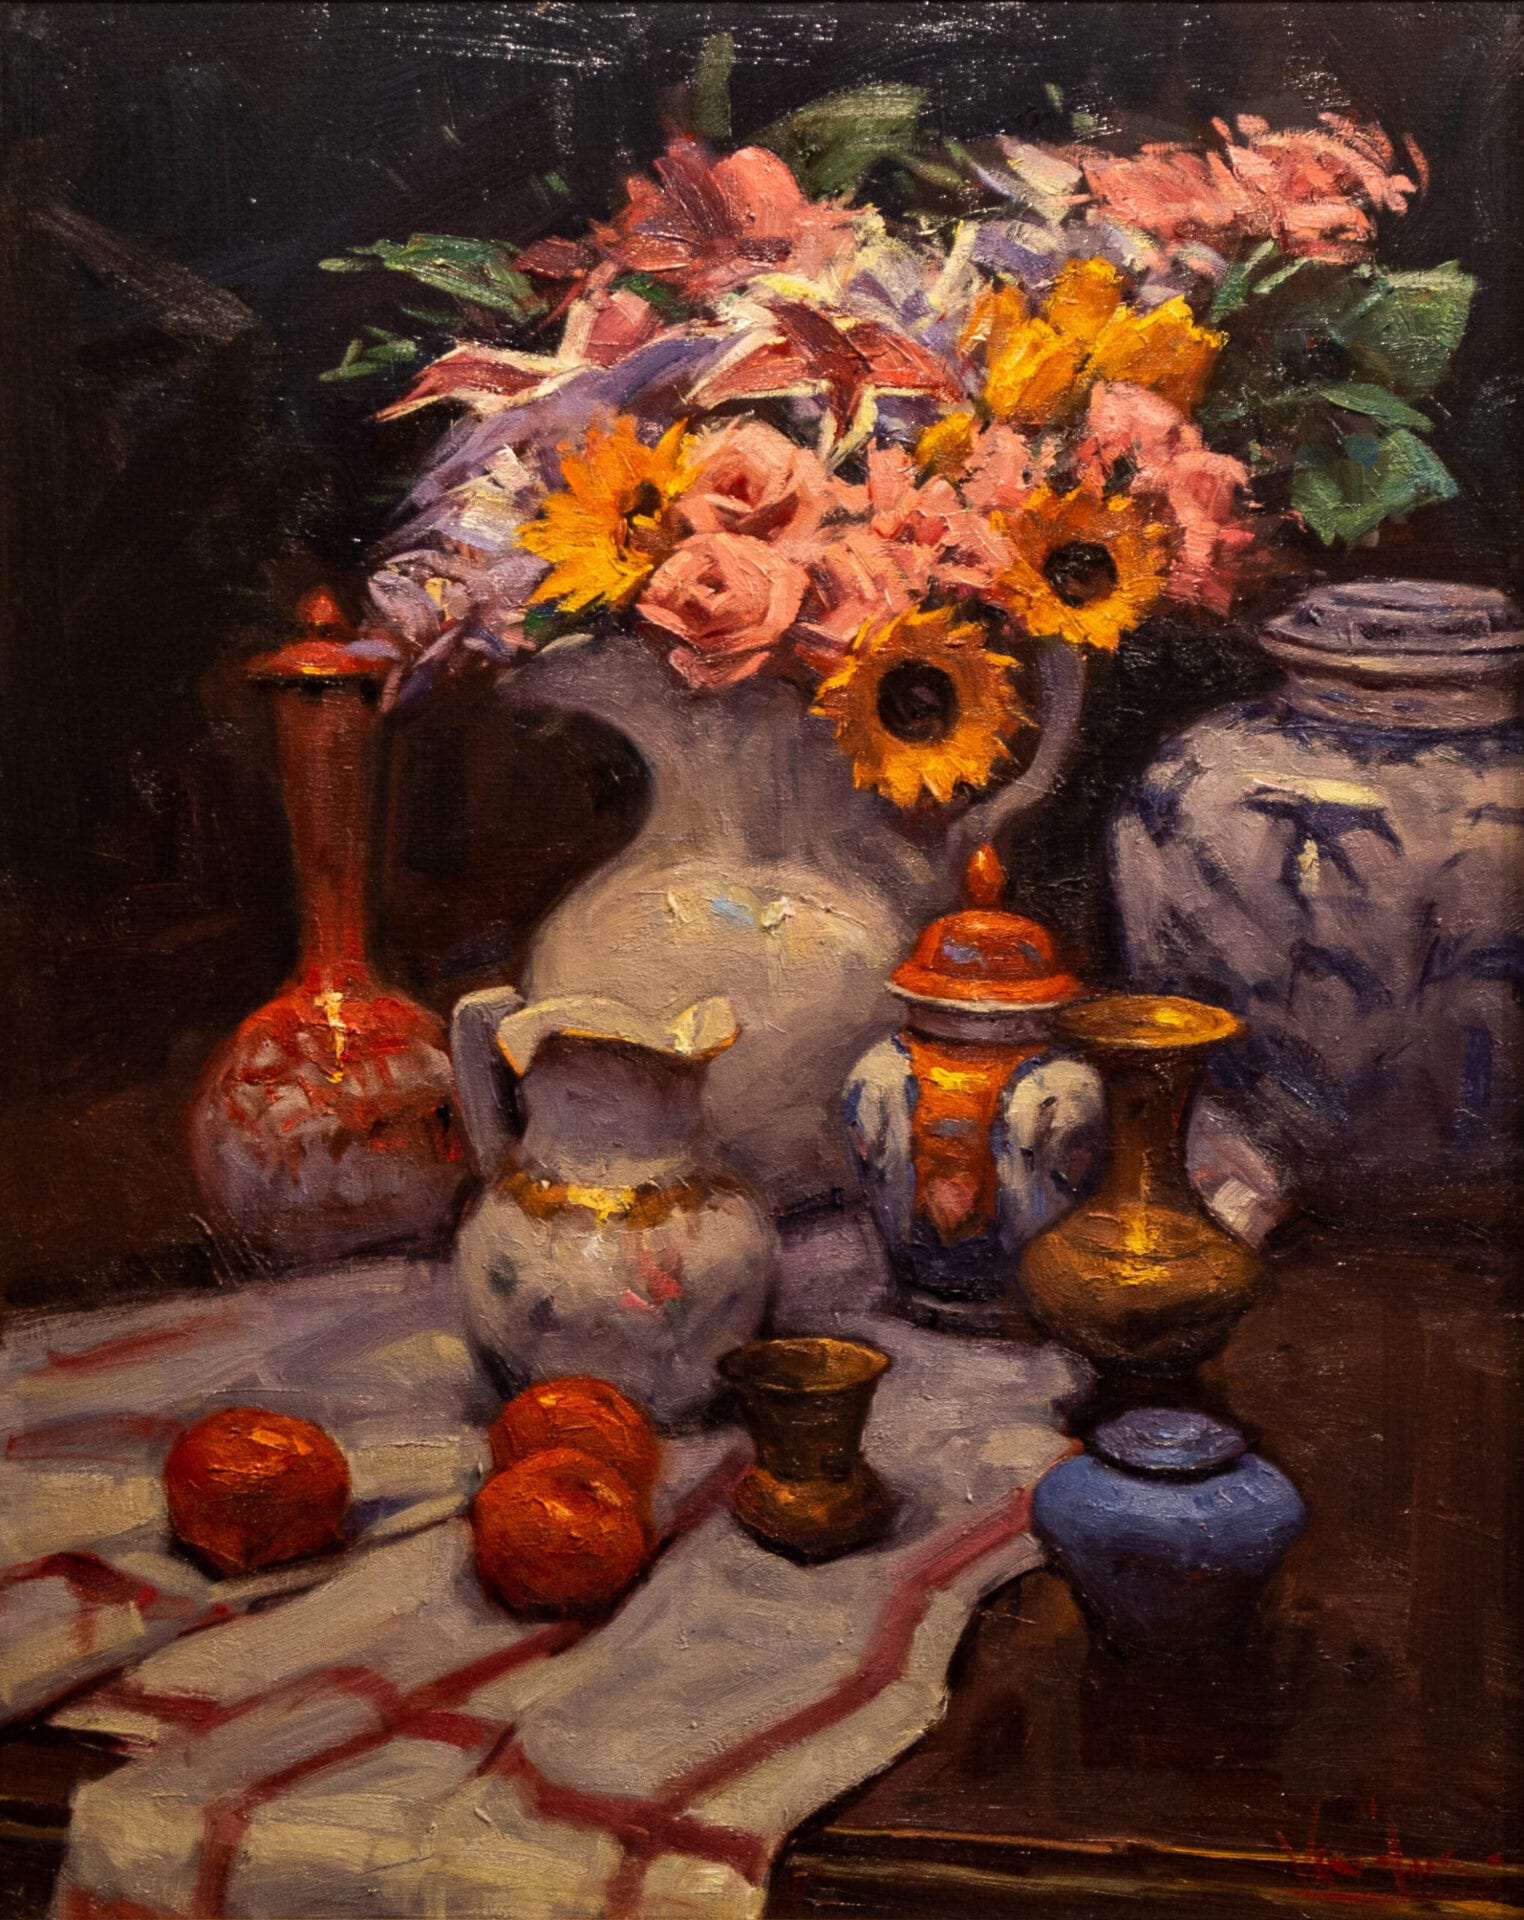 George Van Hook - Still Life with Large Vase